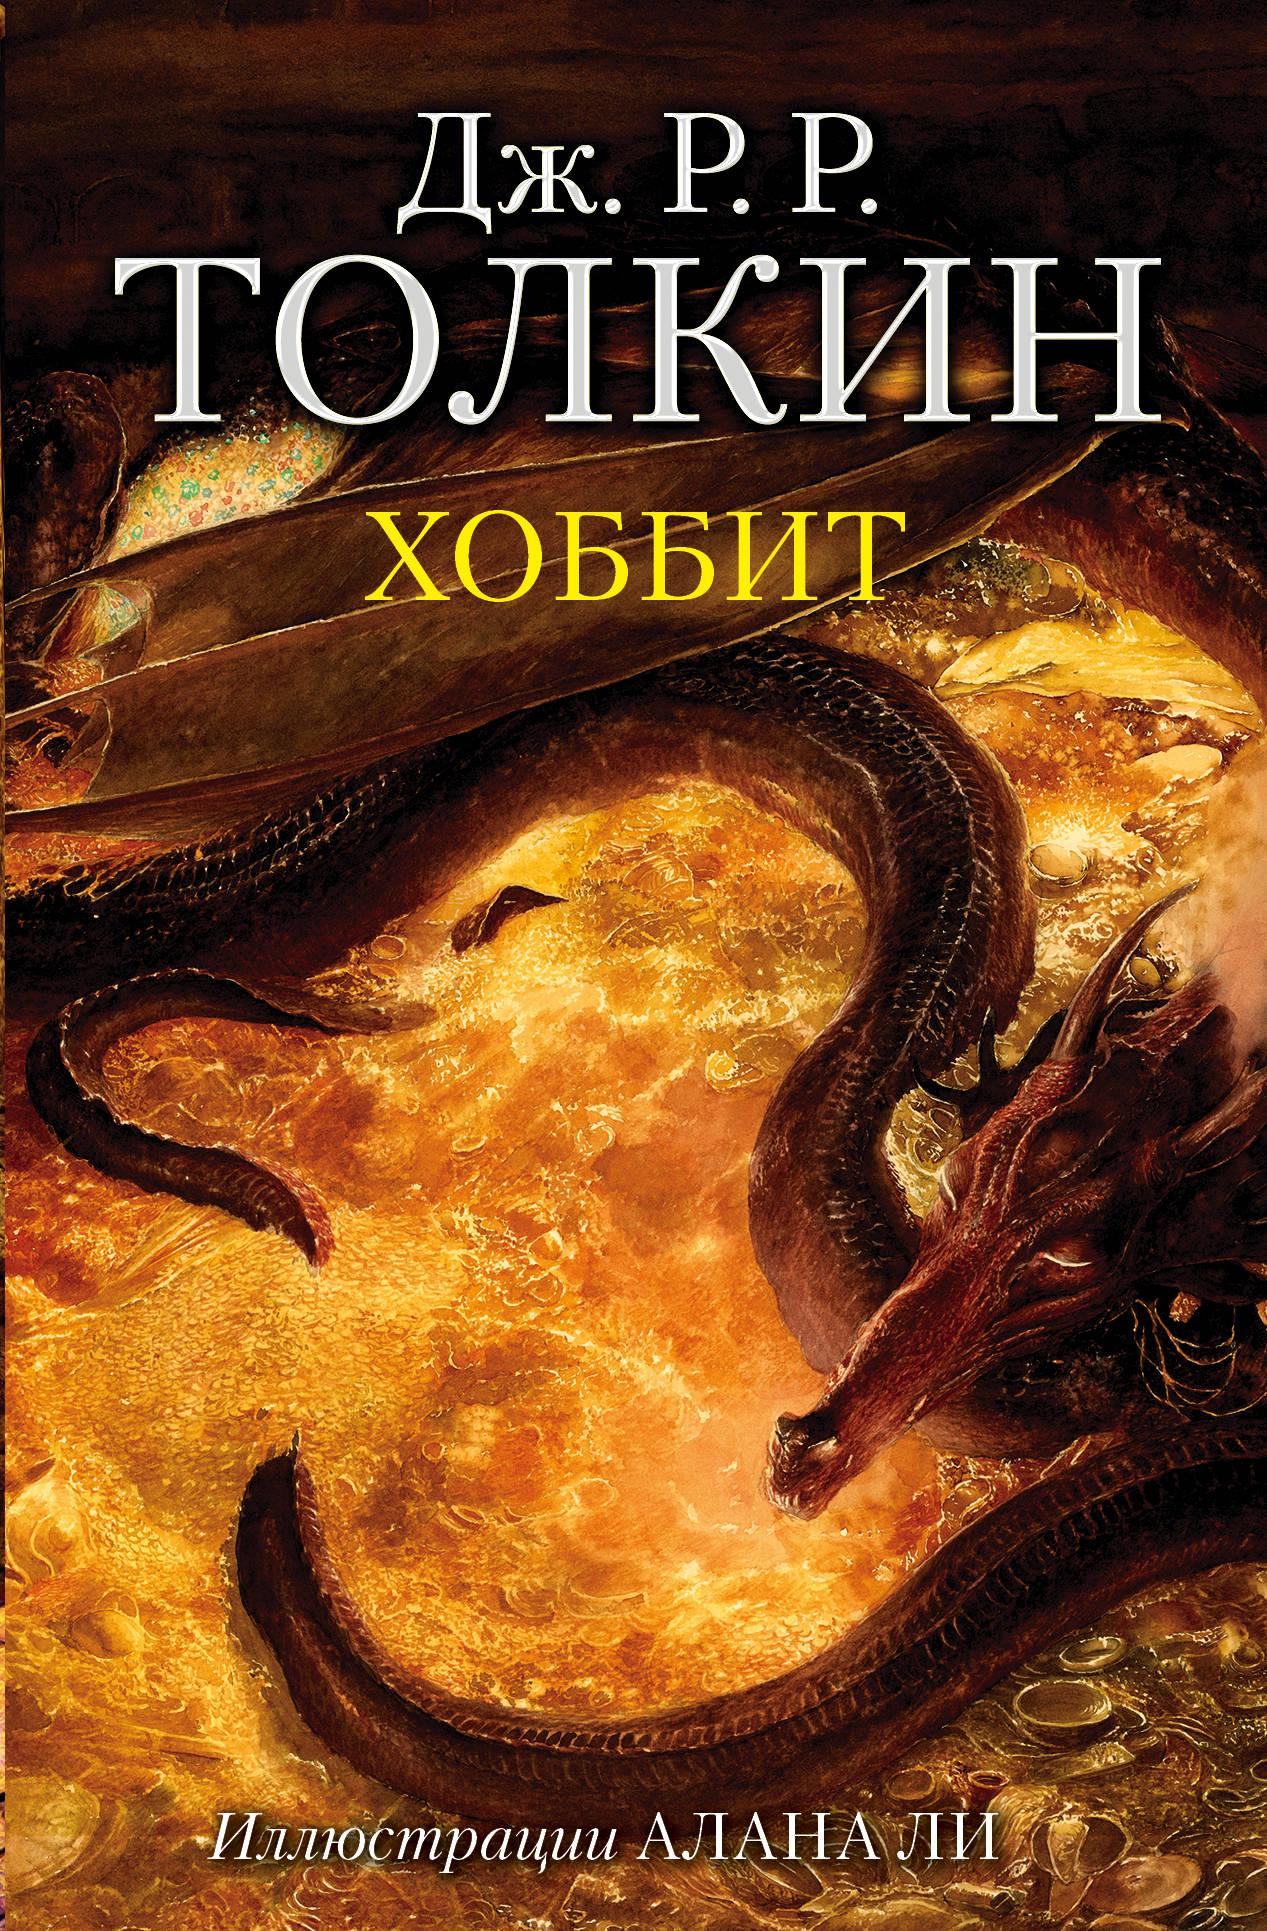 Дж. Р. Р. Толкин Хоббит джон р р толкин возвращение государя